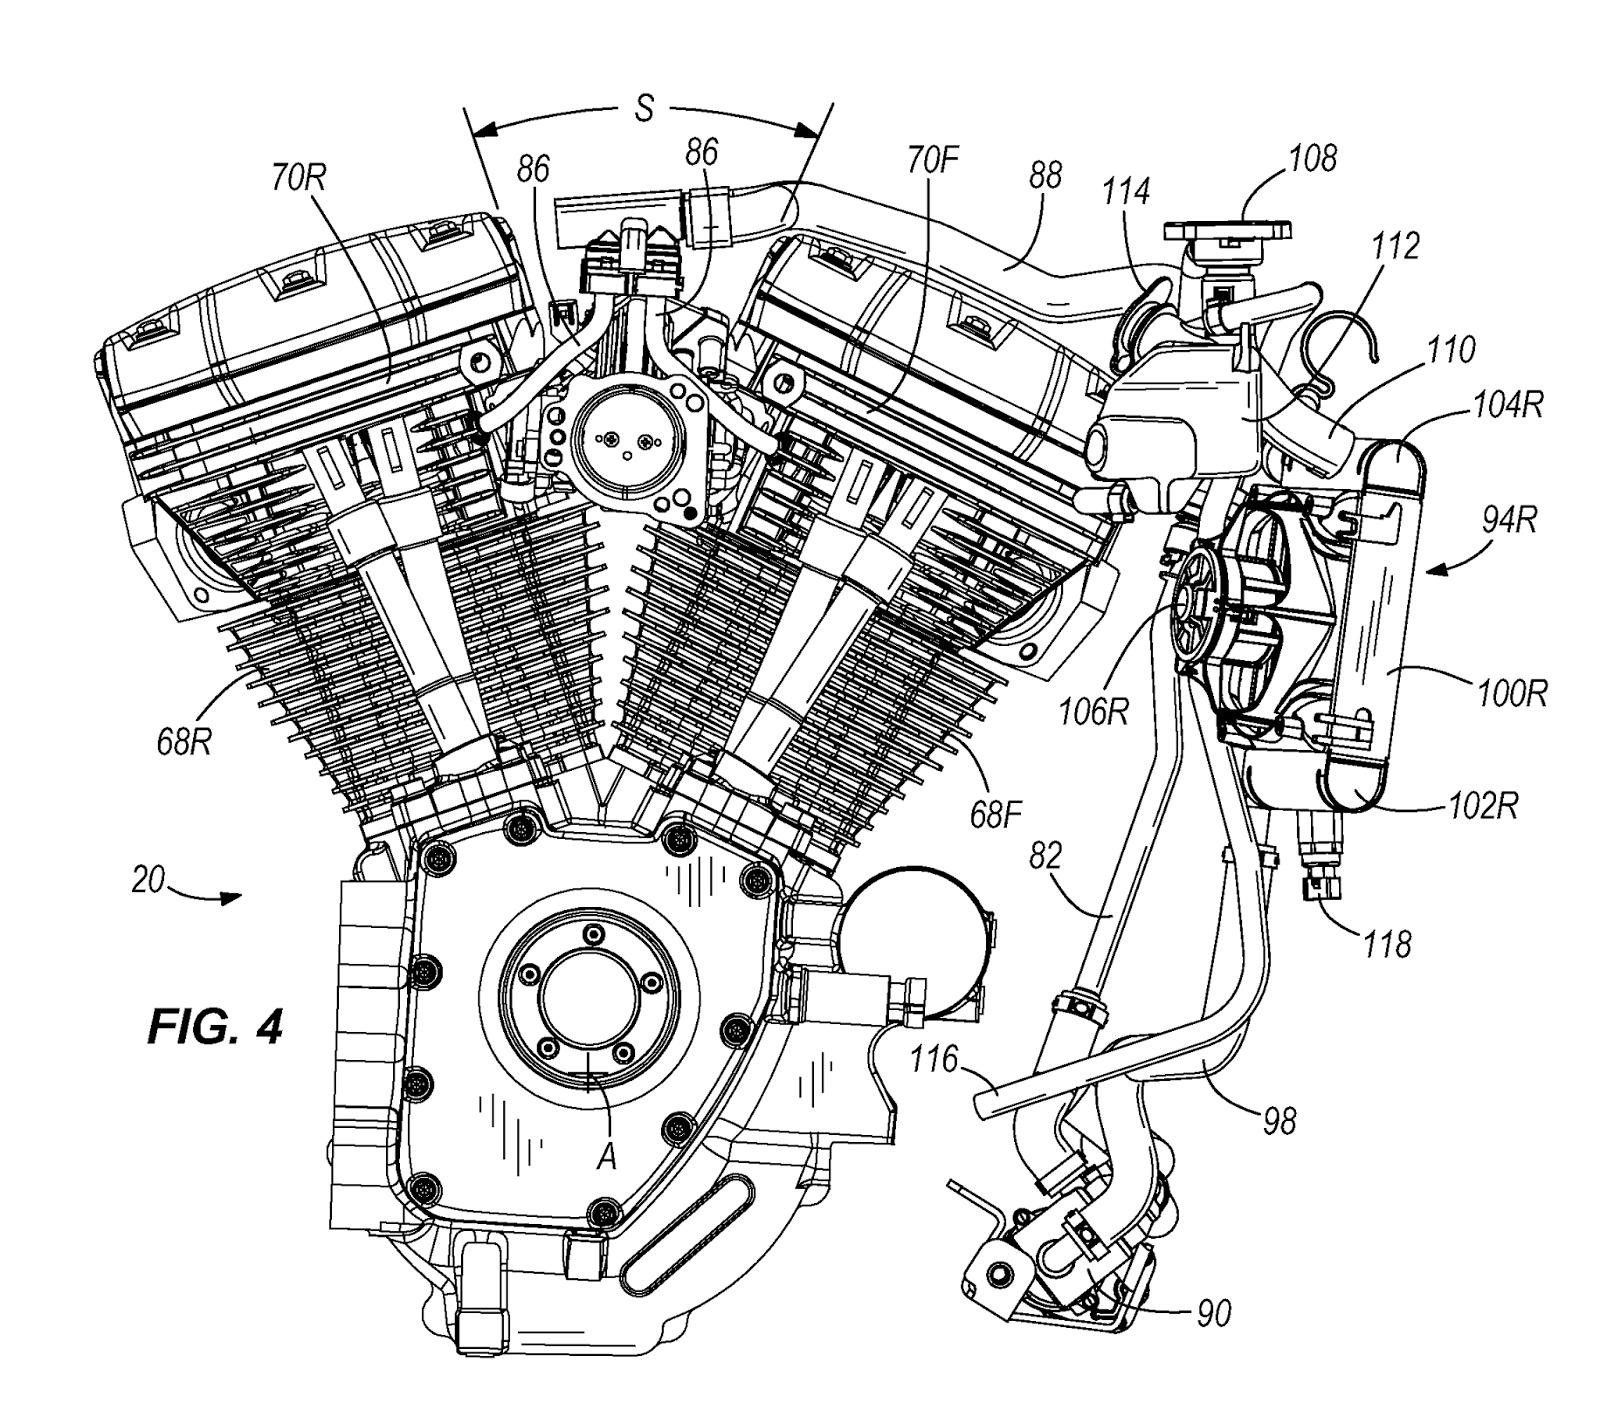 Harley Davidson Twin Cam 103 Engine Diagram Diagram Auto